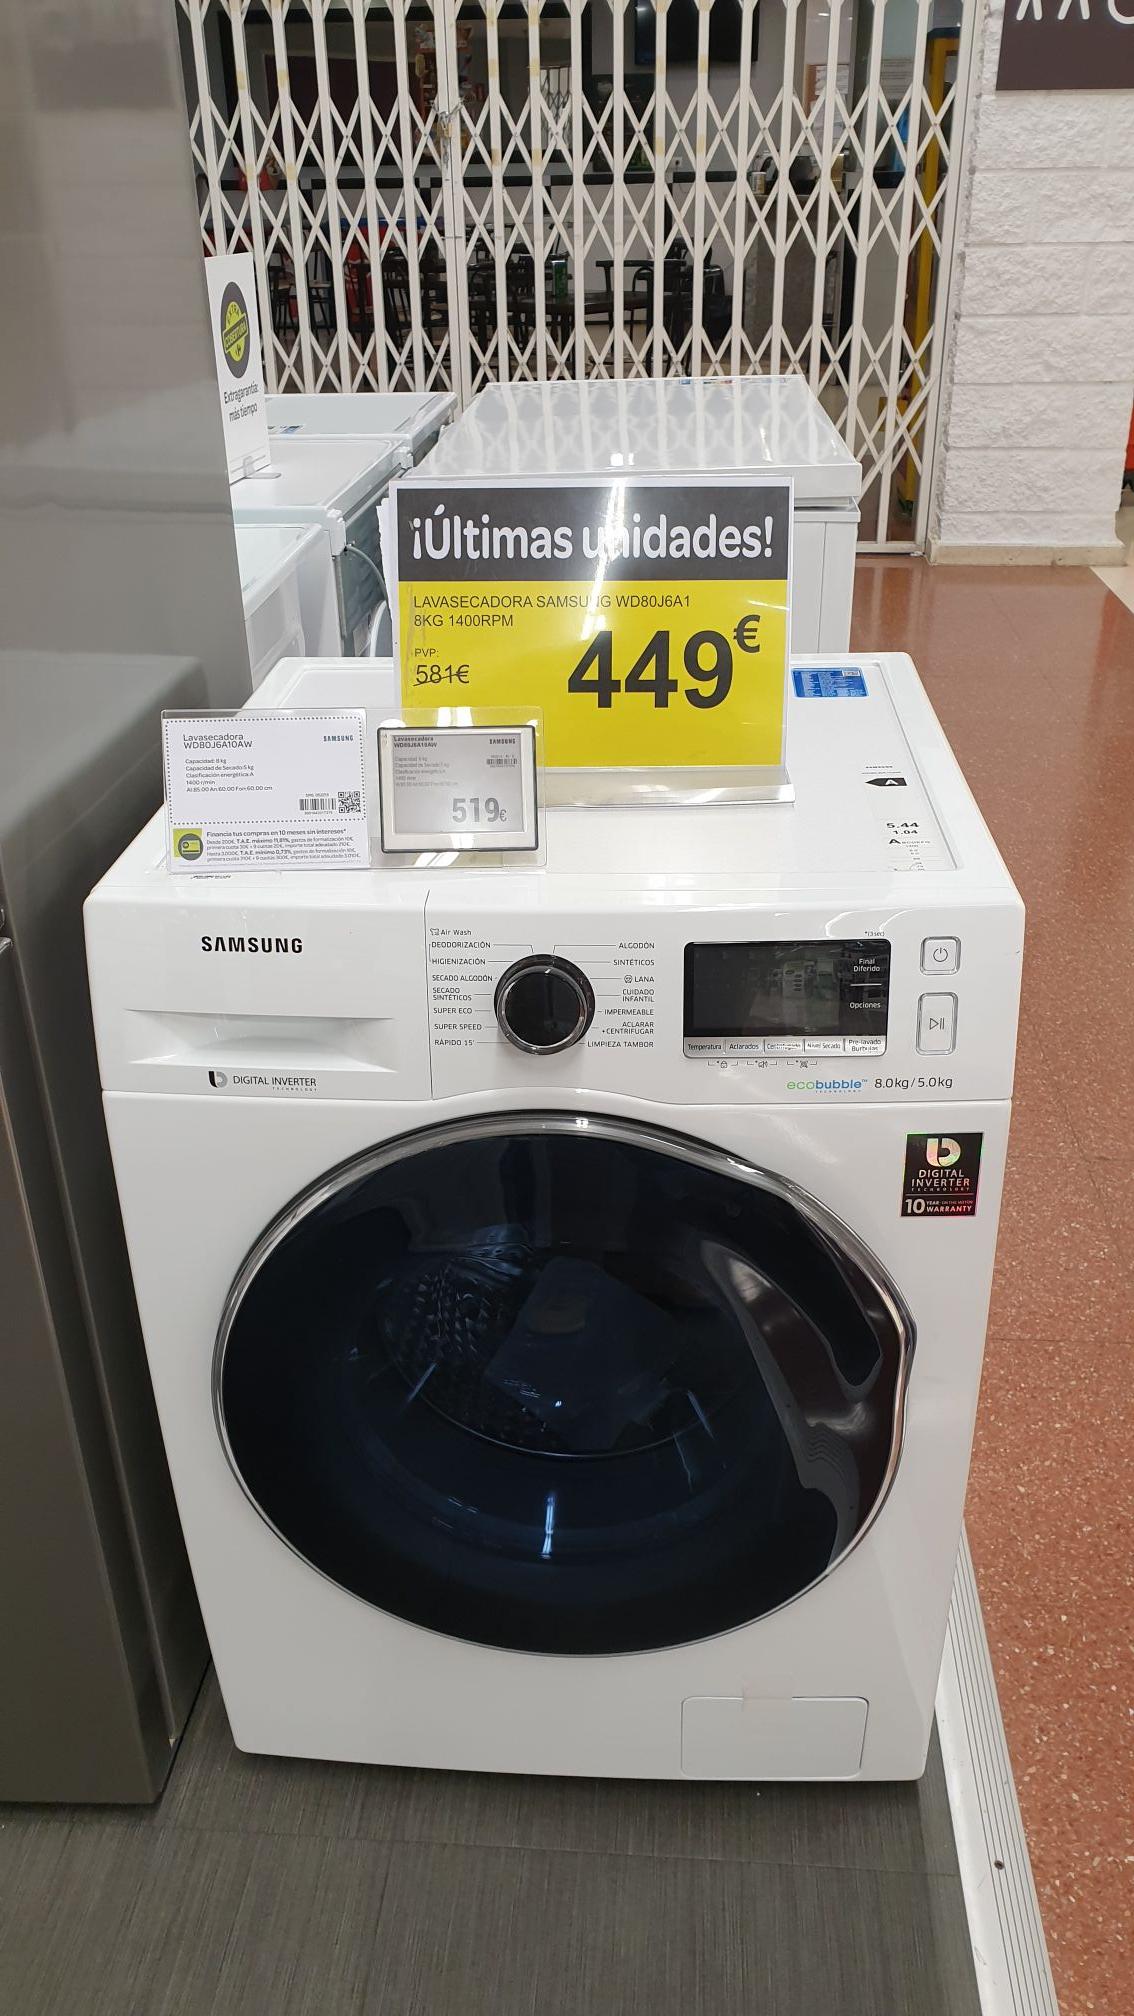 Lavasecadora Samsung wd80j6a1